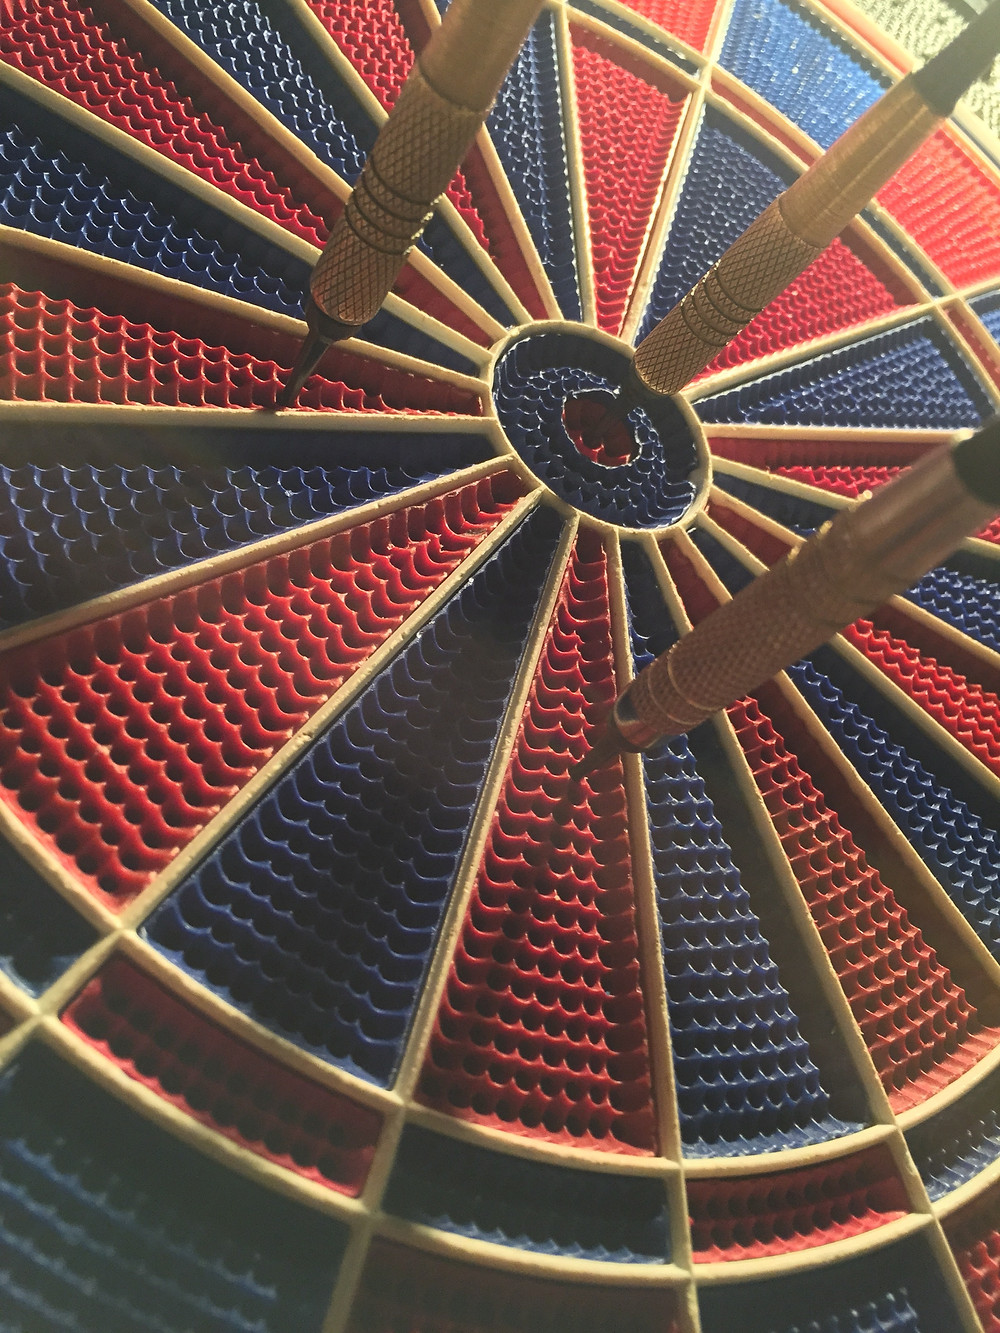 Hit your target! (credit pexels.com)